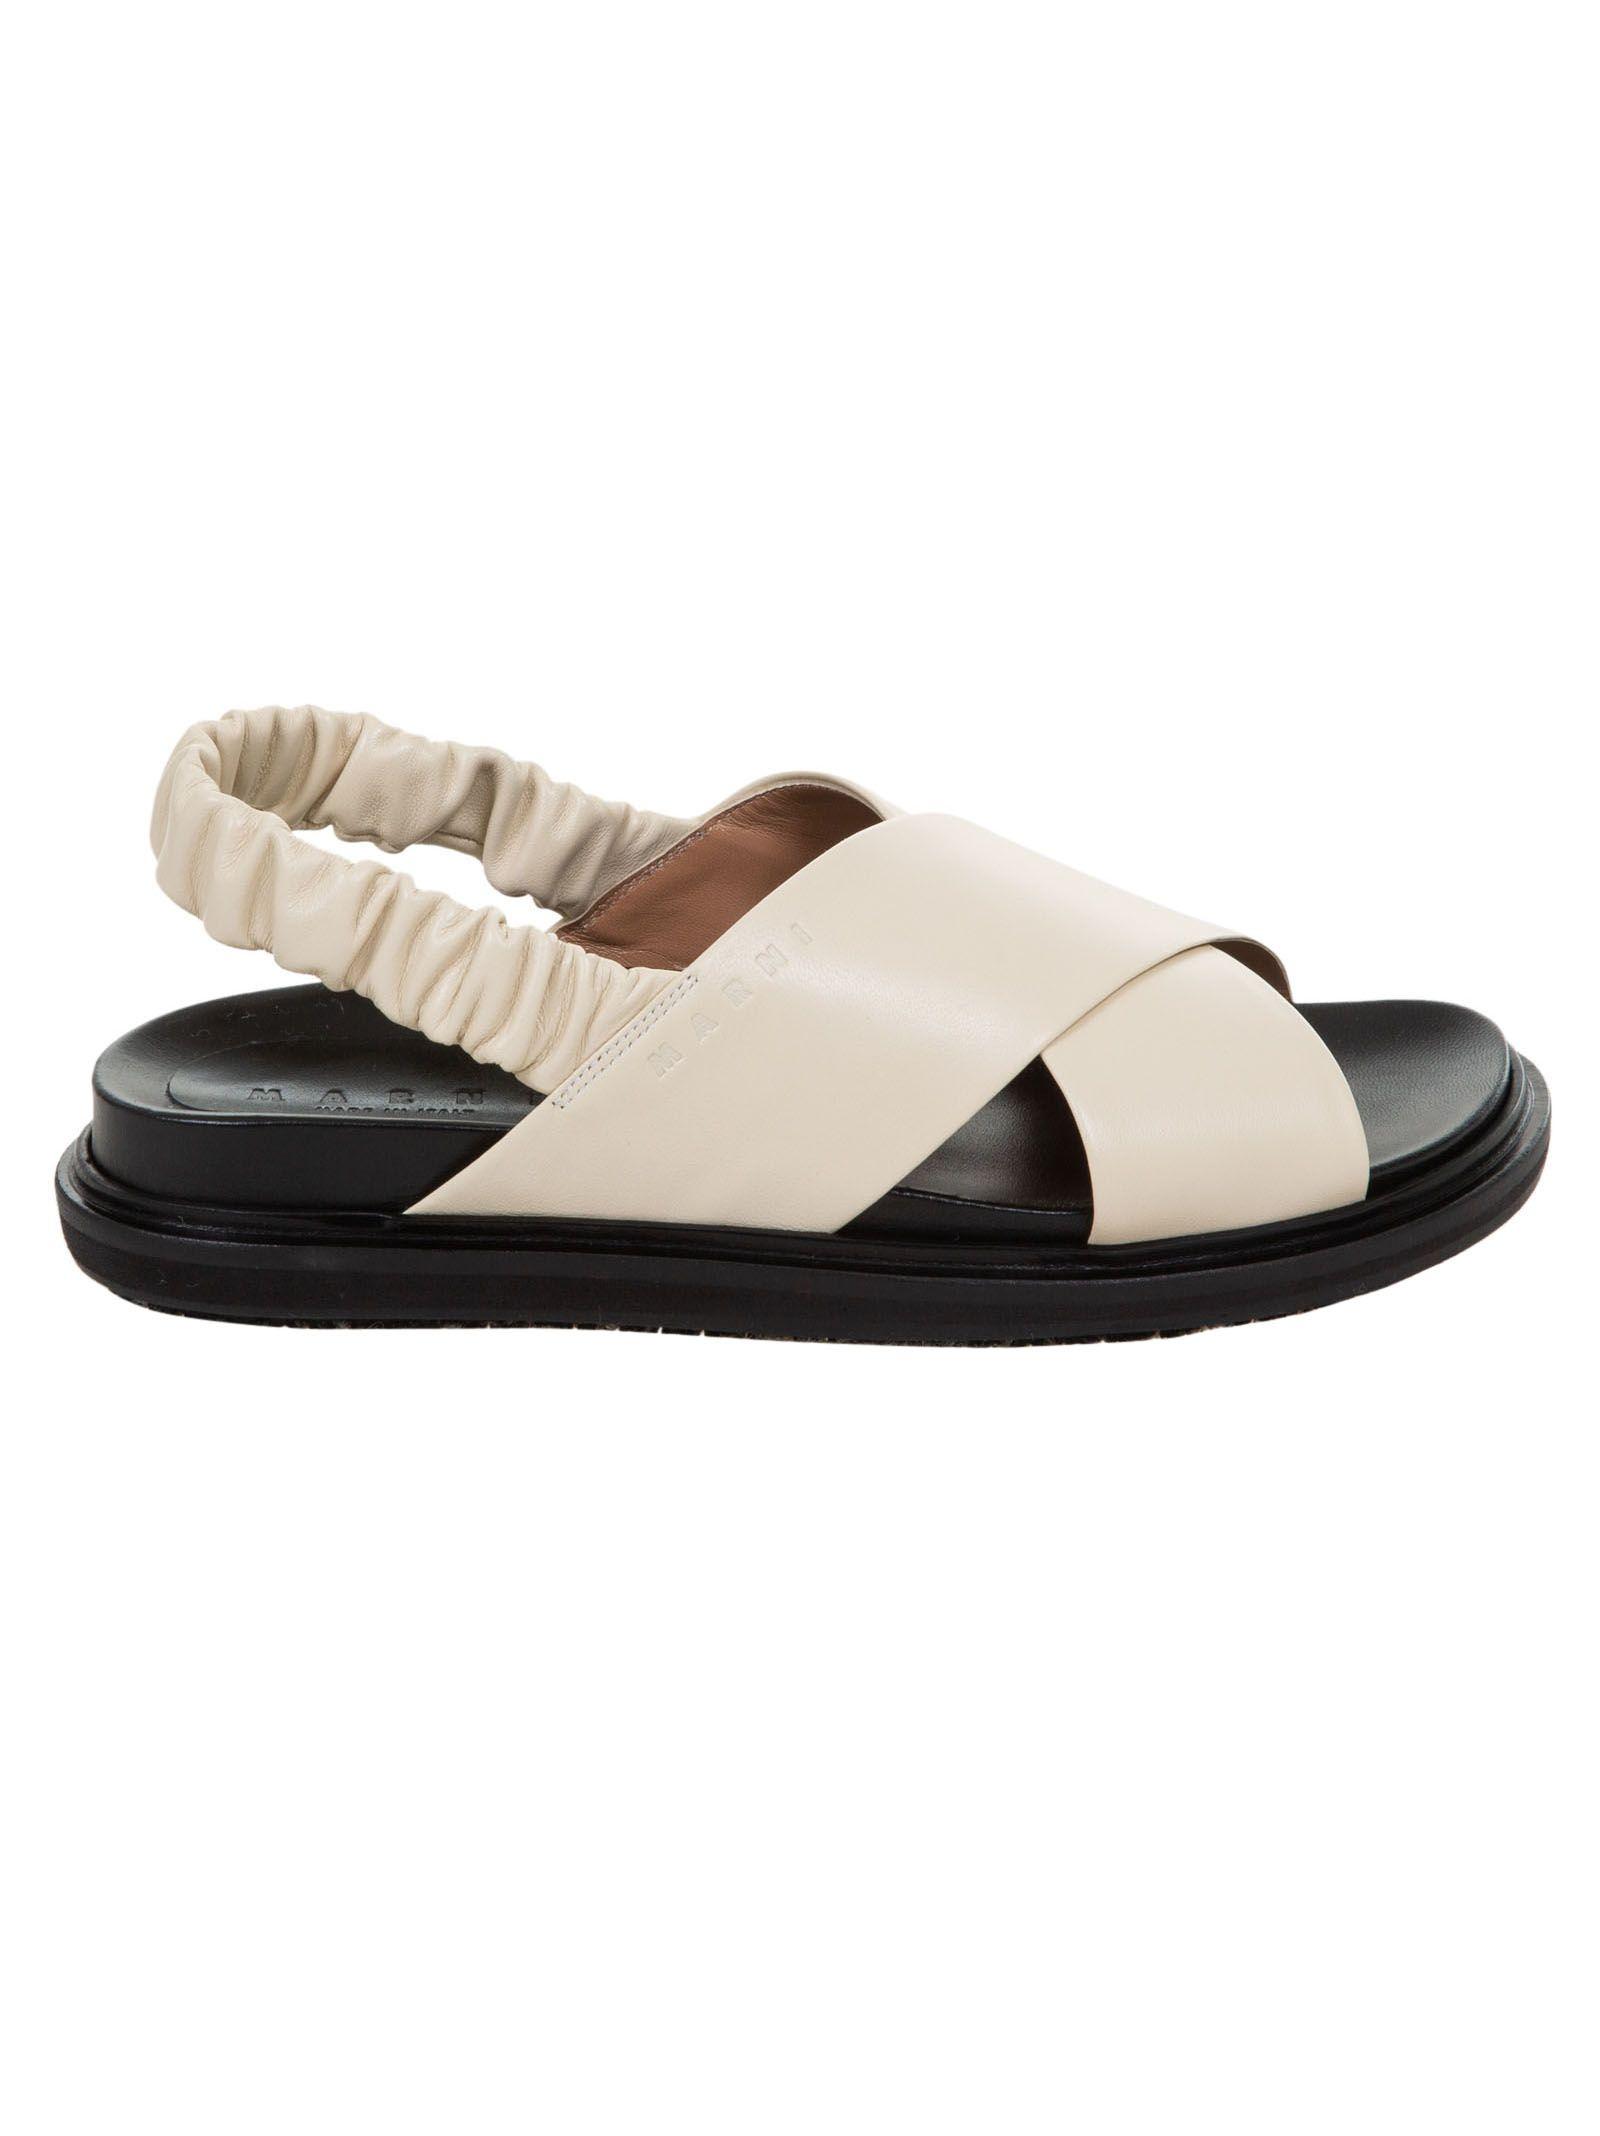 Marni Sandals | italist, ALWAYS LIKE A SALE